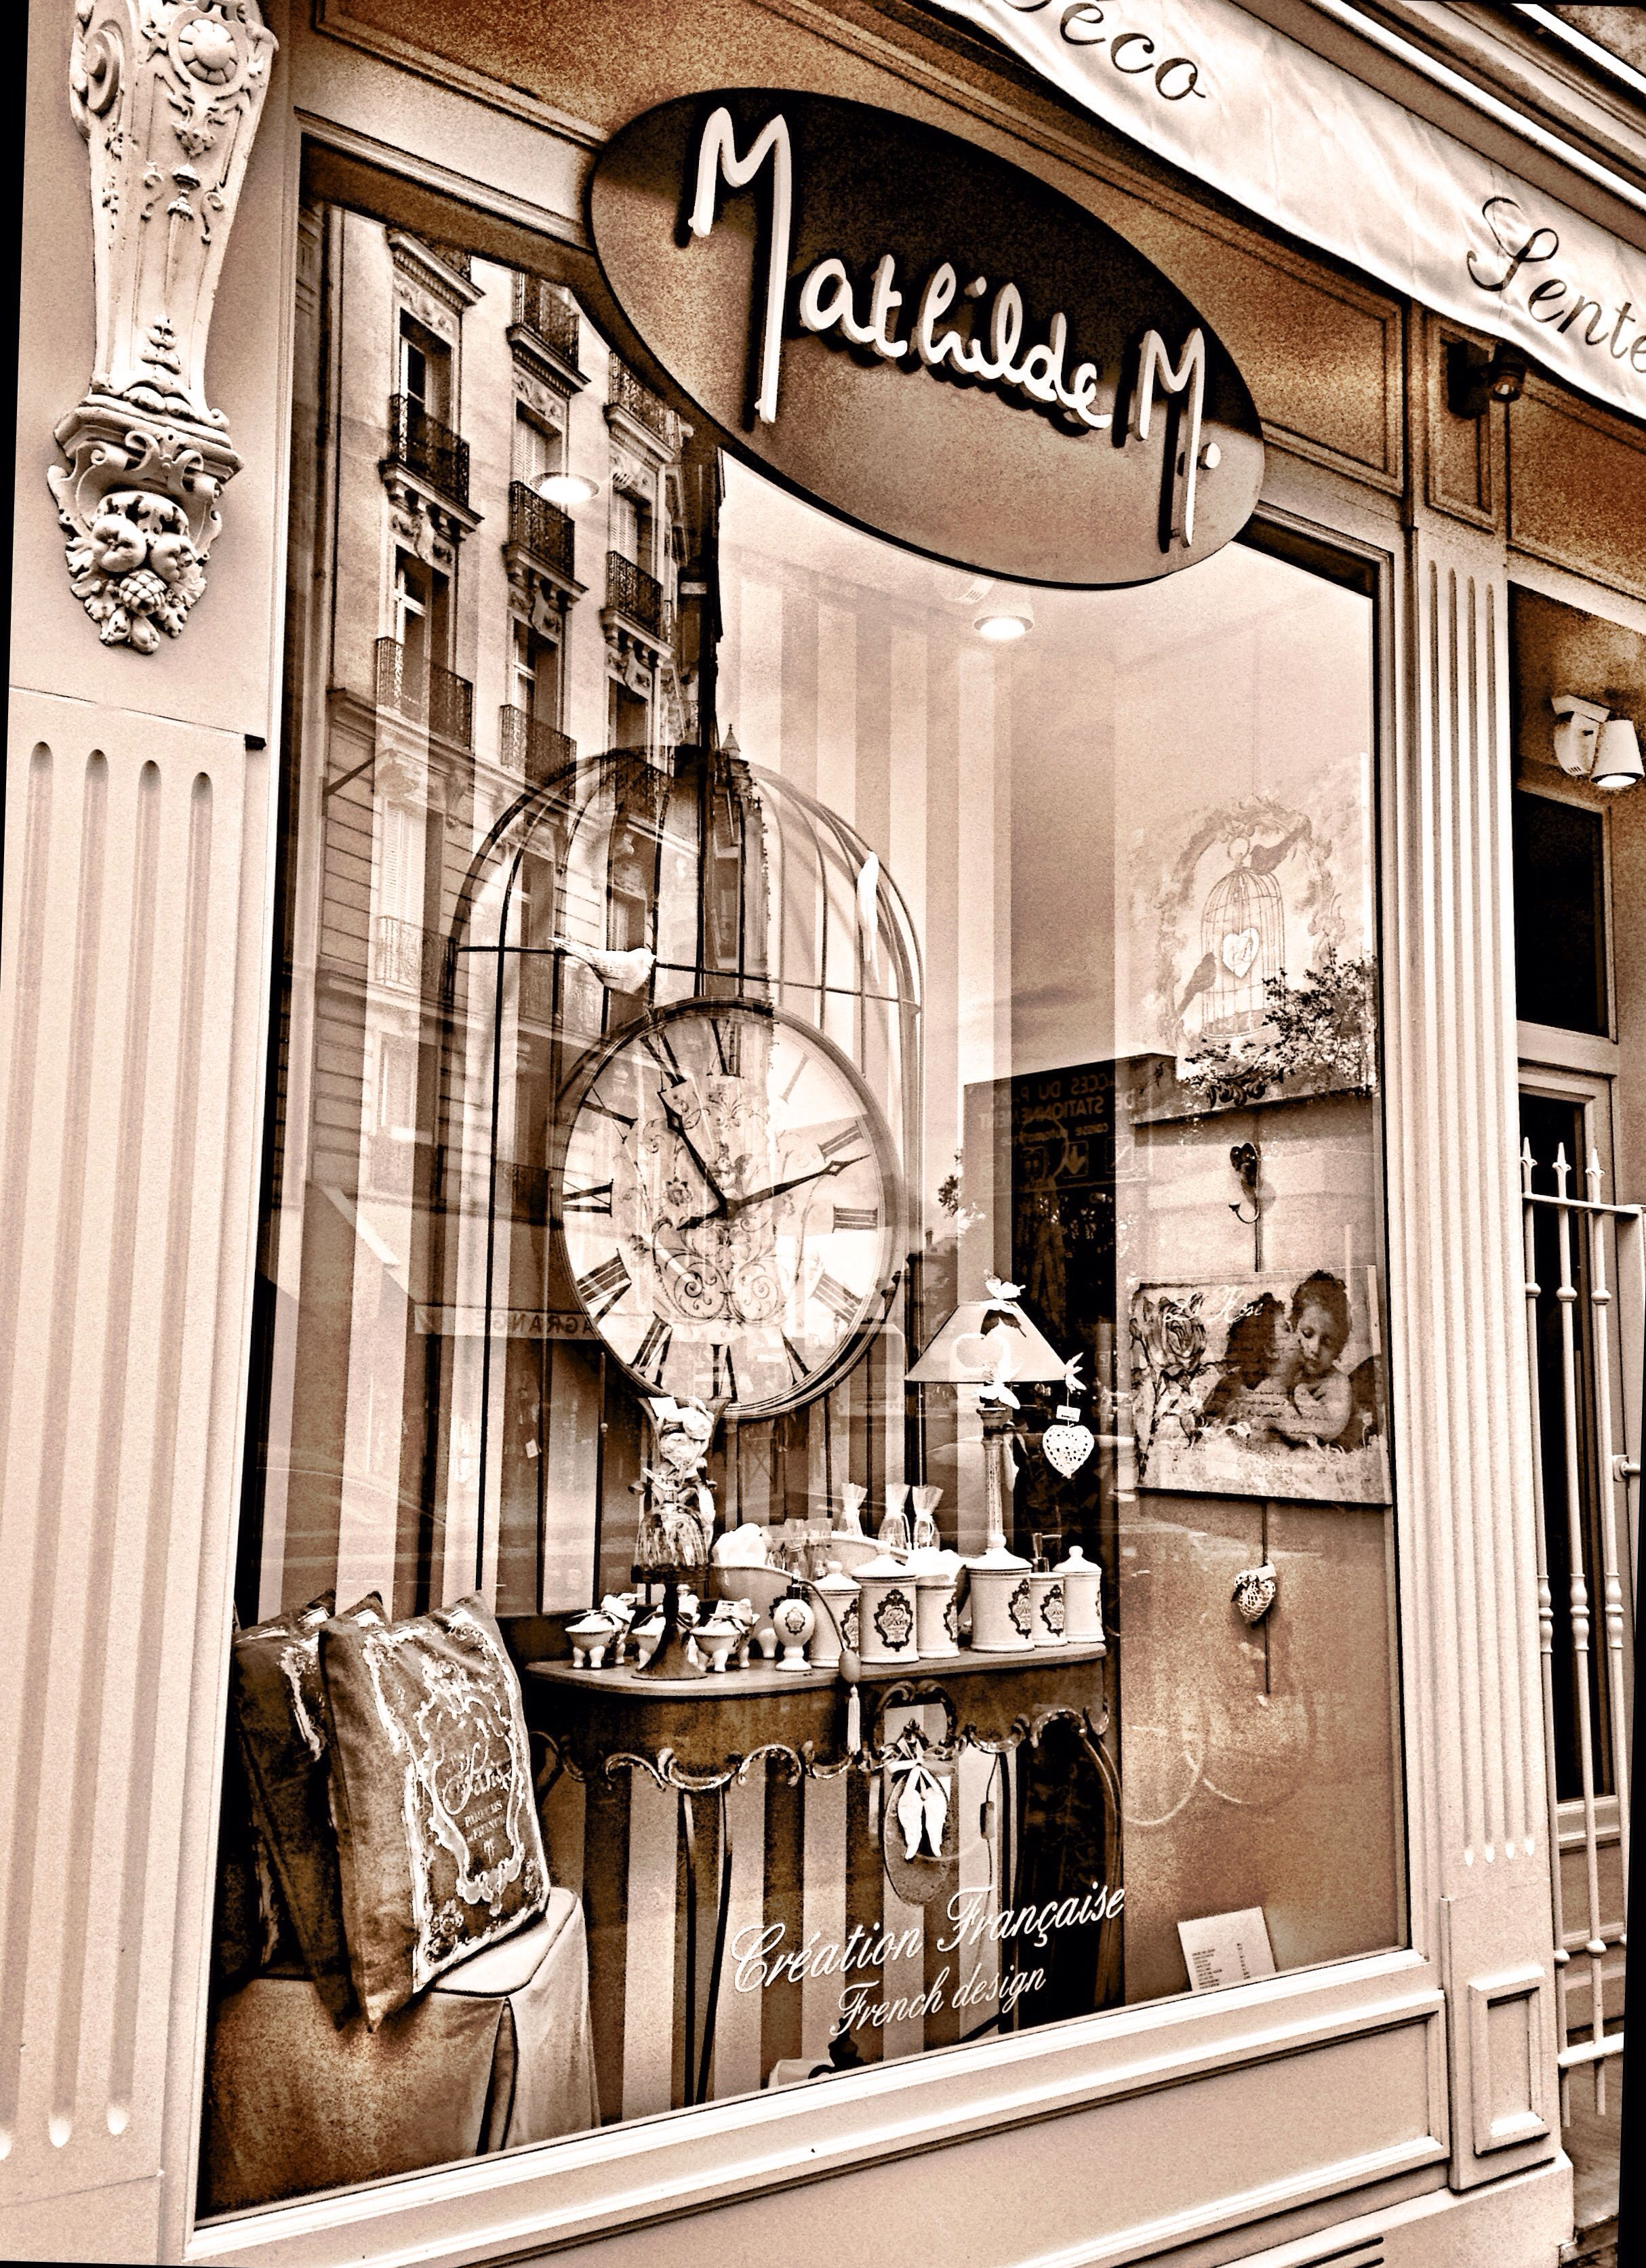 Boutique Mathilde M storefront photography - mathilde m. boutique, paris, france   paris